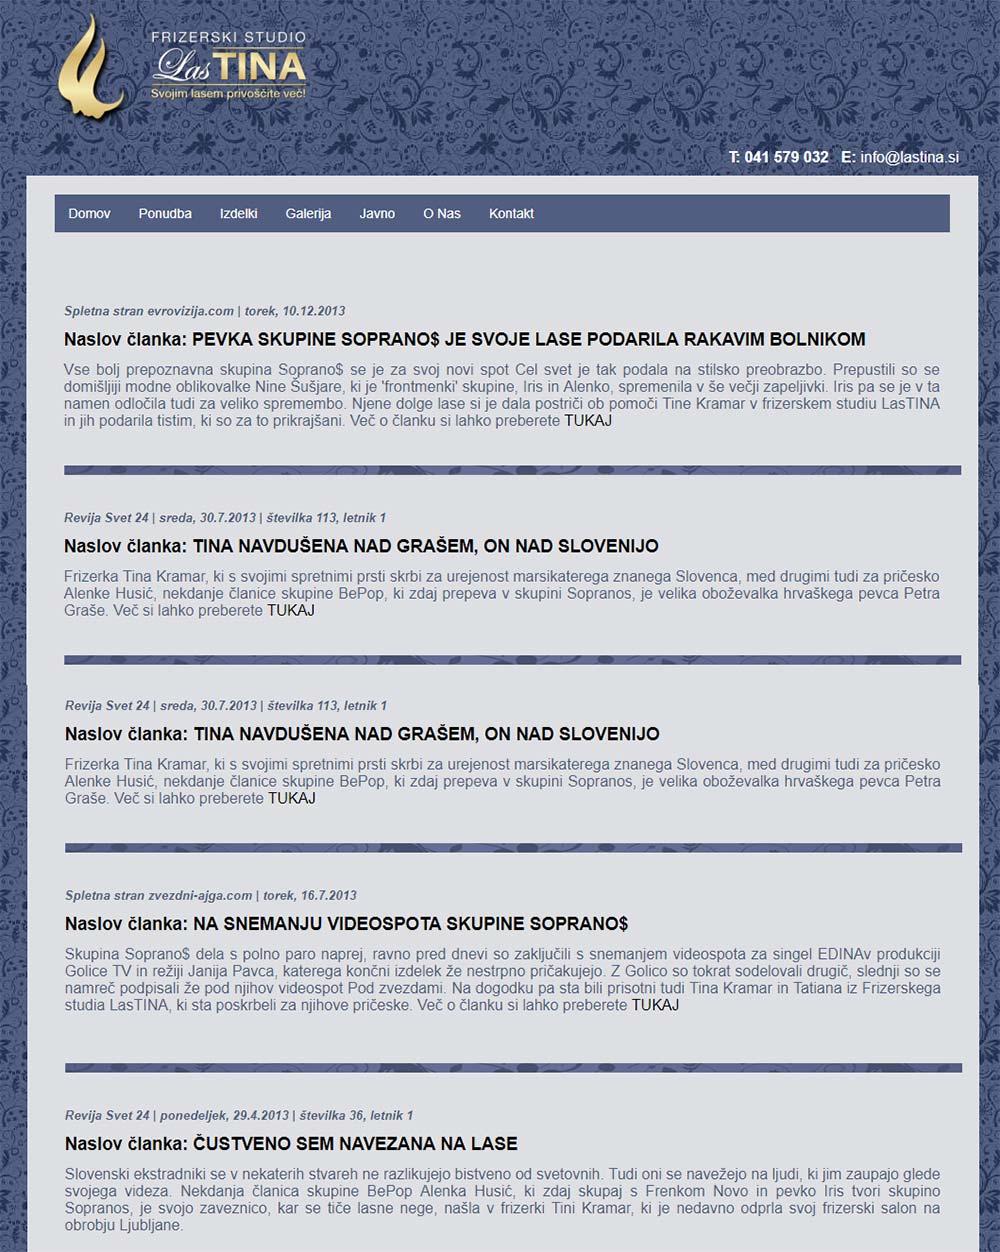 vizualno-oblikovanje-LasTina (7)